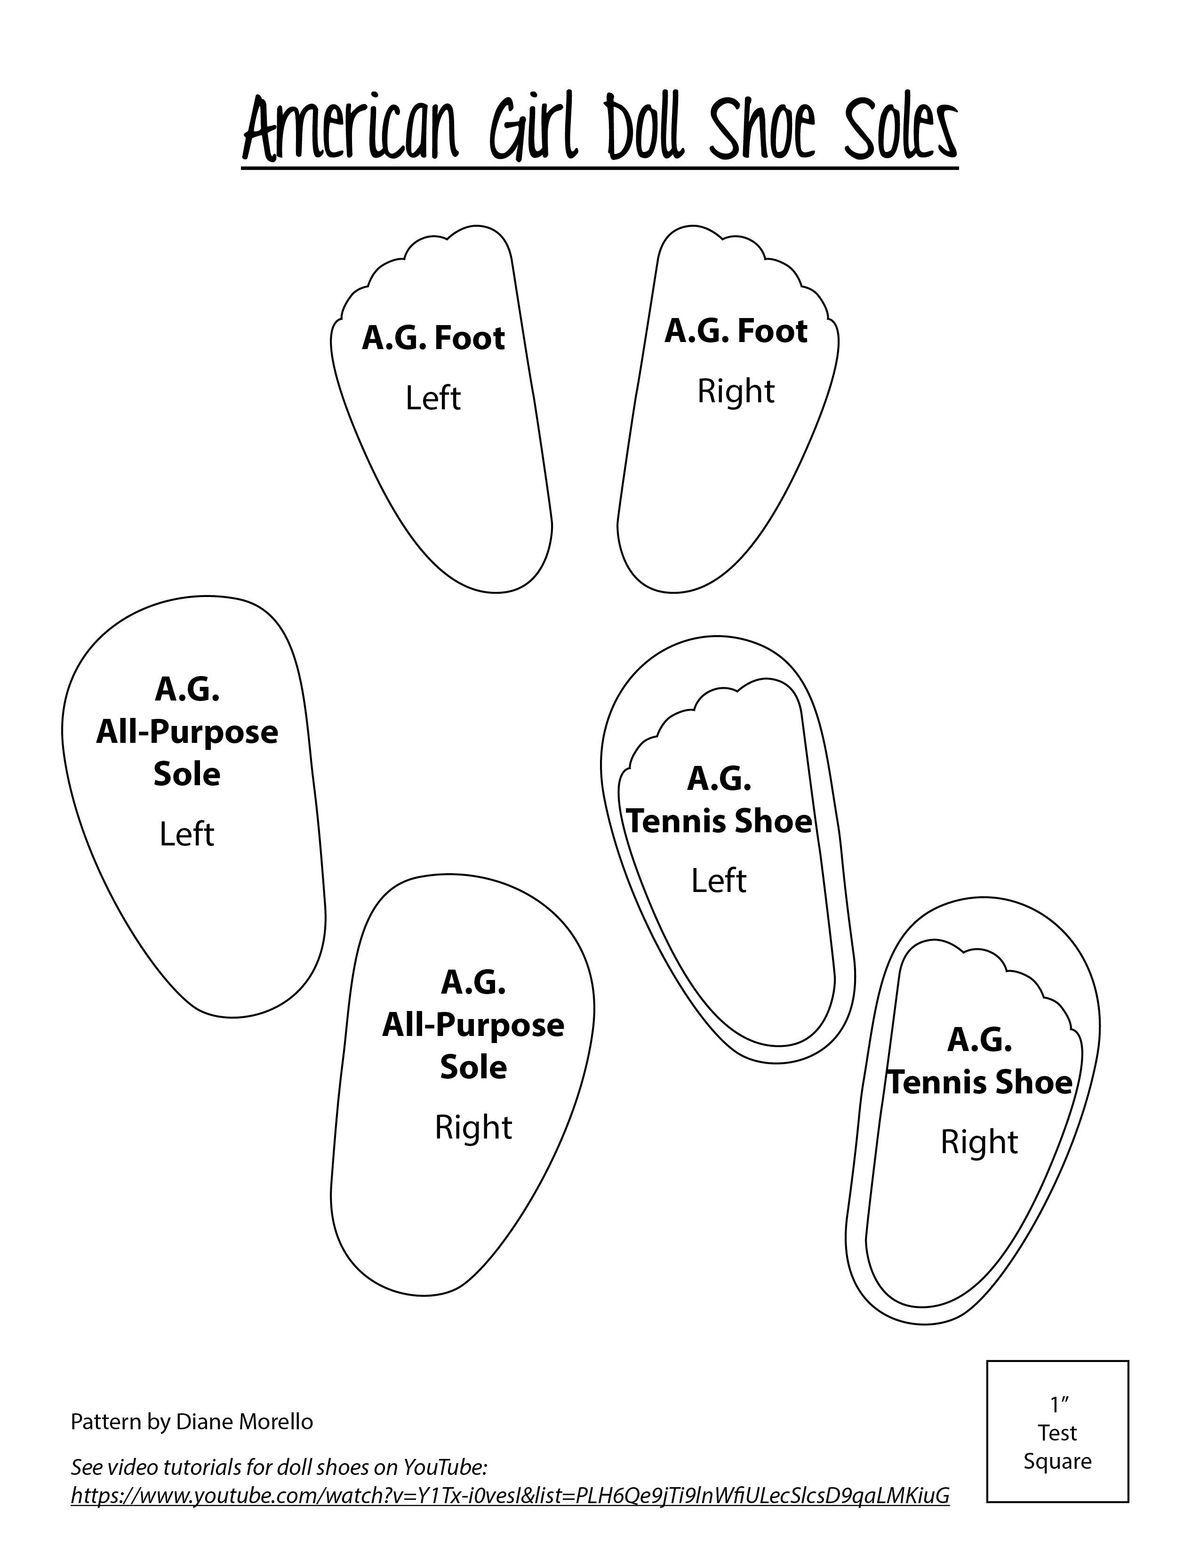 D39b885f09c6d5e3982a669fb3297475 Jpg 1 200 1 553 Pixels Doll Shoe Patterns American Girl Doll Shoes American Girl Doll Patterns